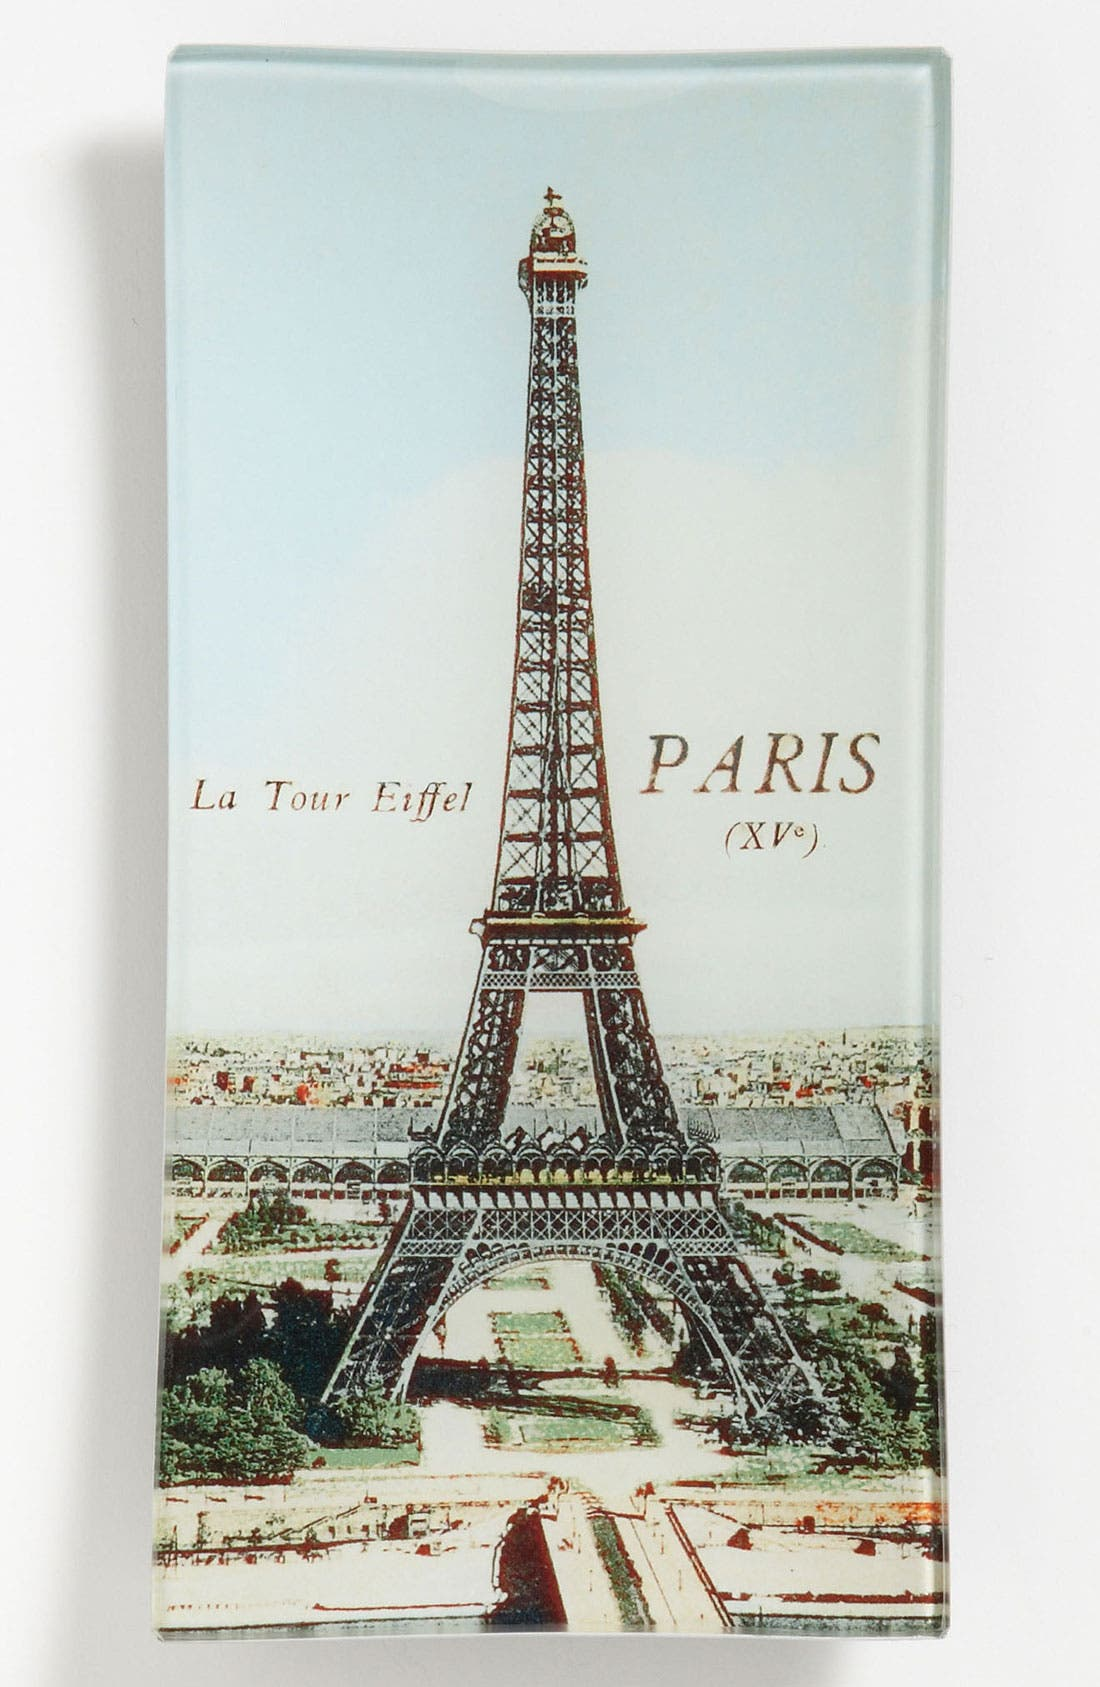 Alternate Image 1 Selected - Ben's Garden 'Eiffel Tower' Trinket Tray